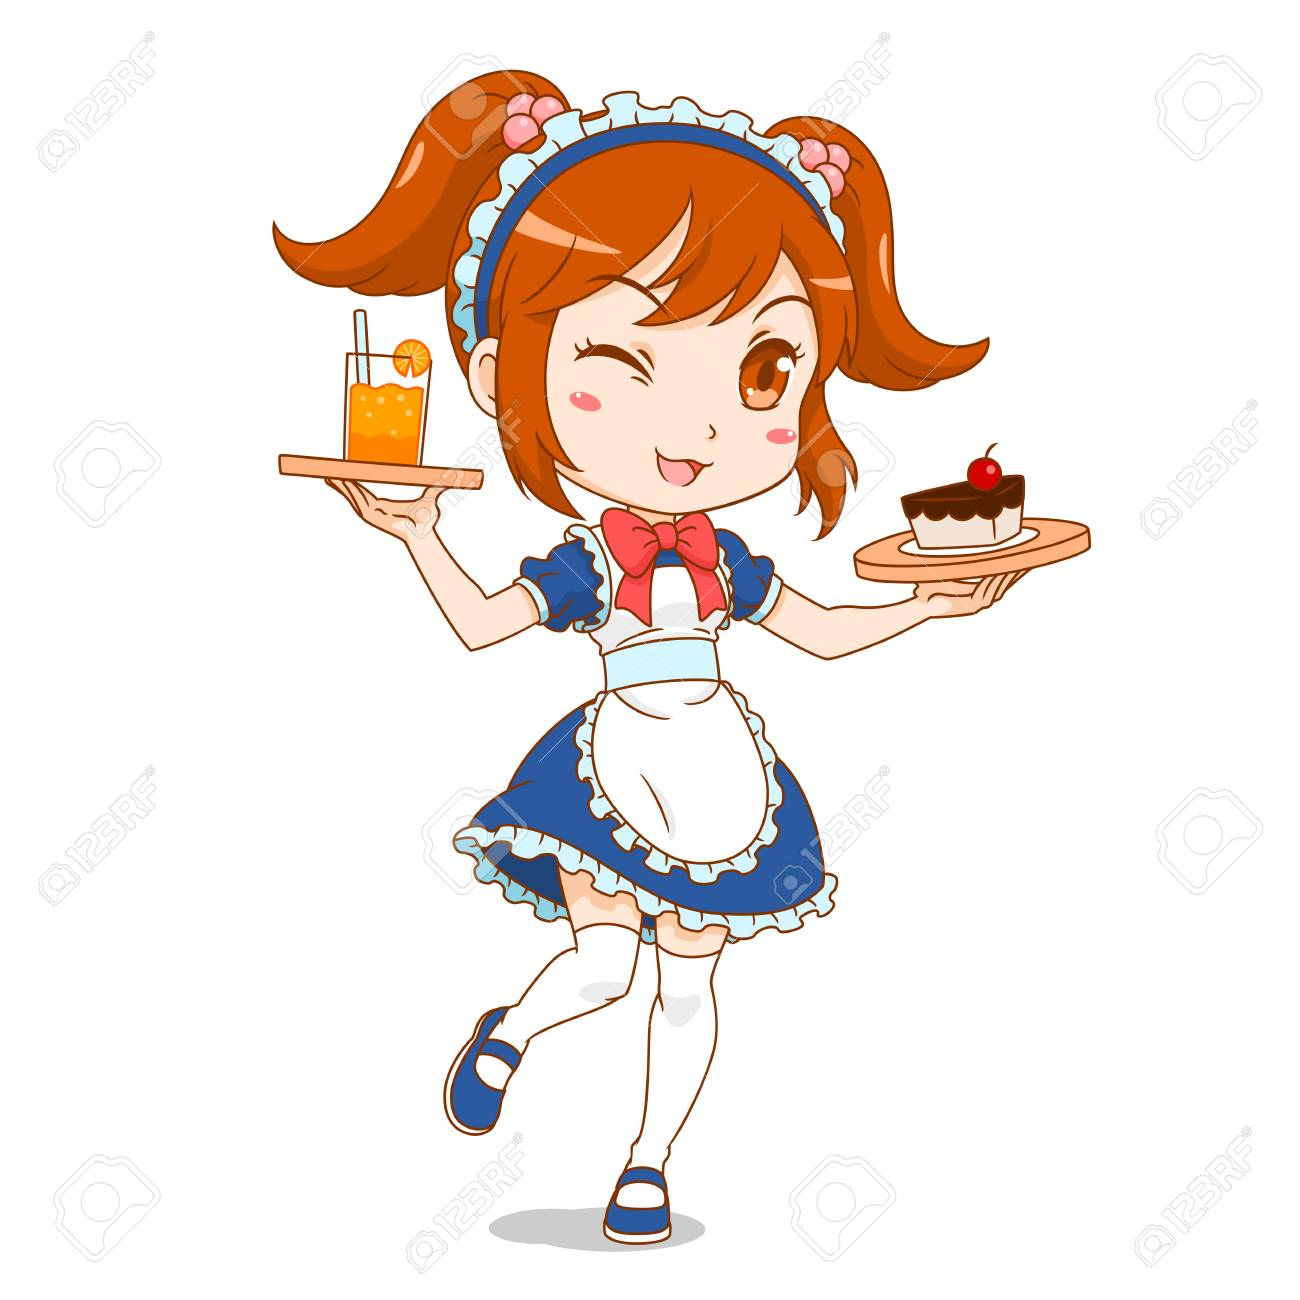 Cartoon character of maid cafe girl. - 120805880